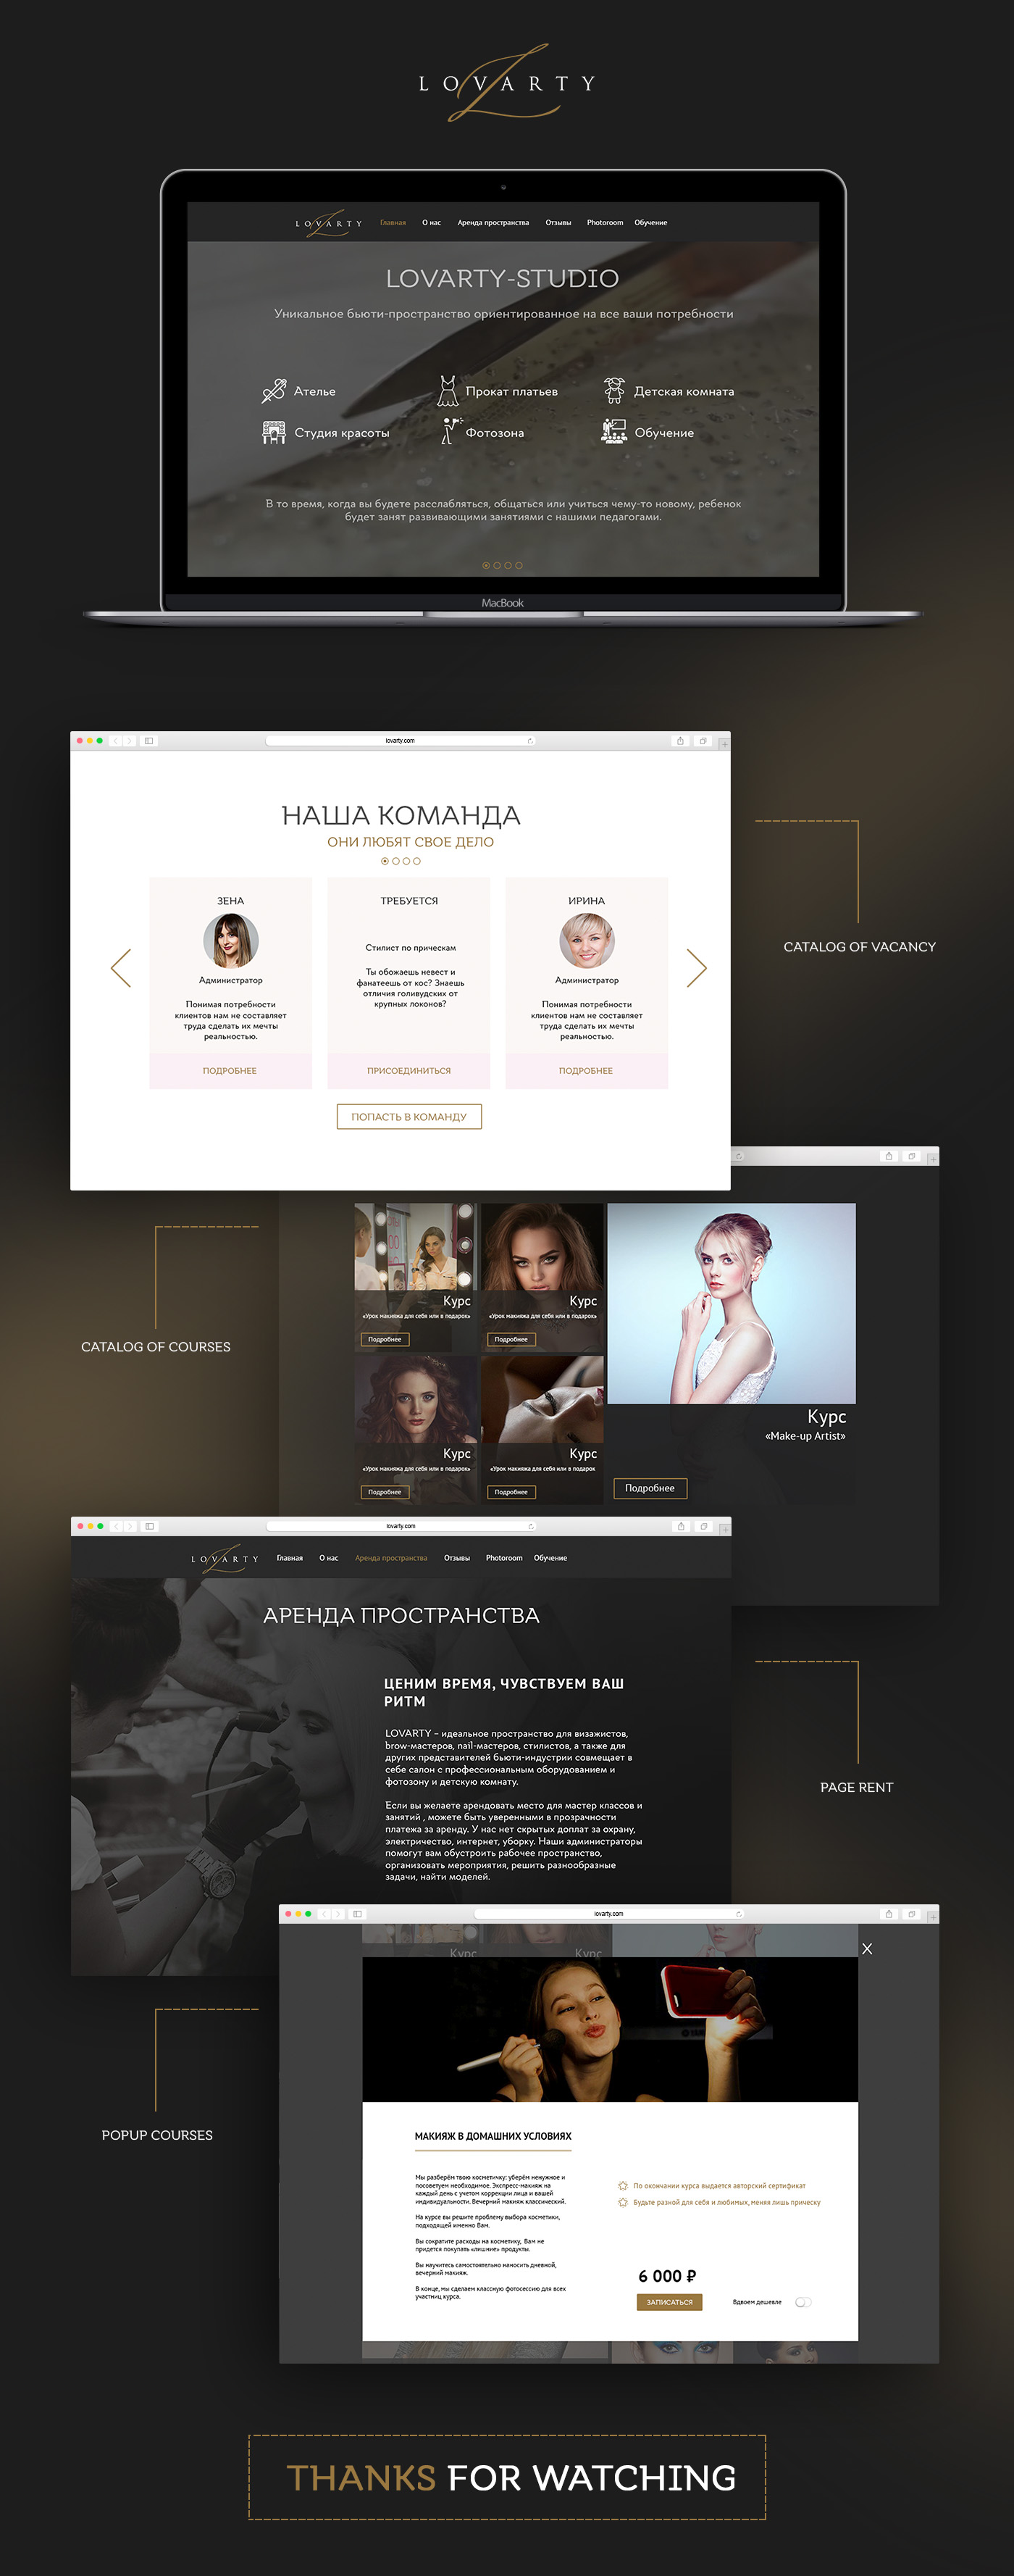 Lovarty - сайт под ключ Дизайн + Верстка